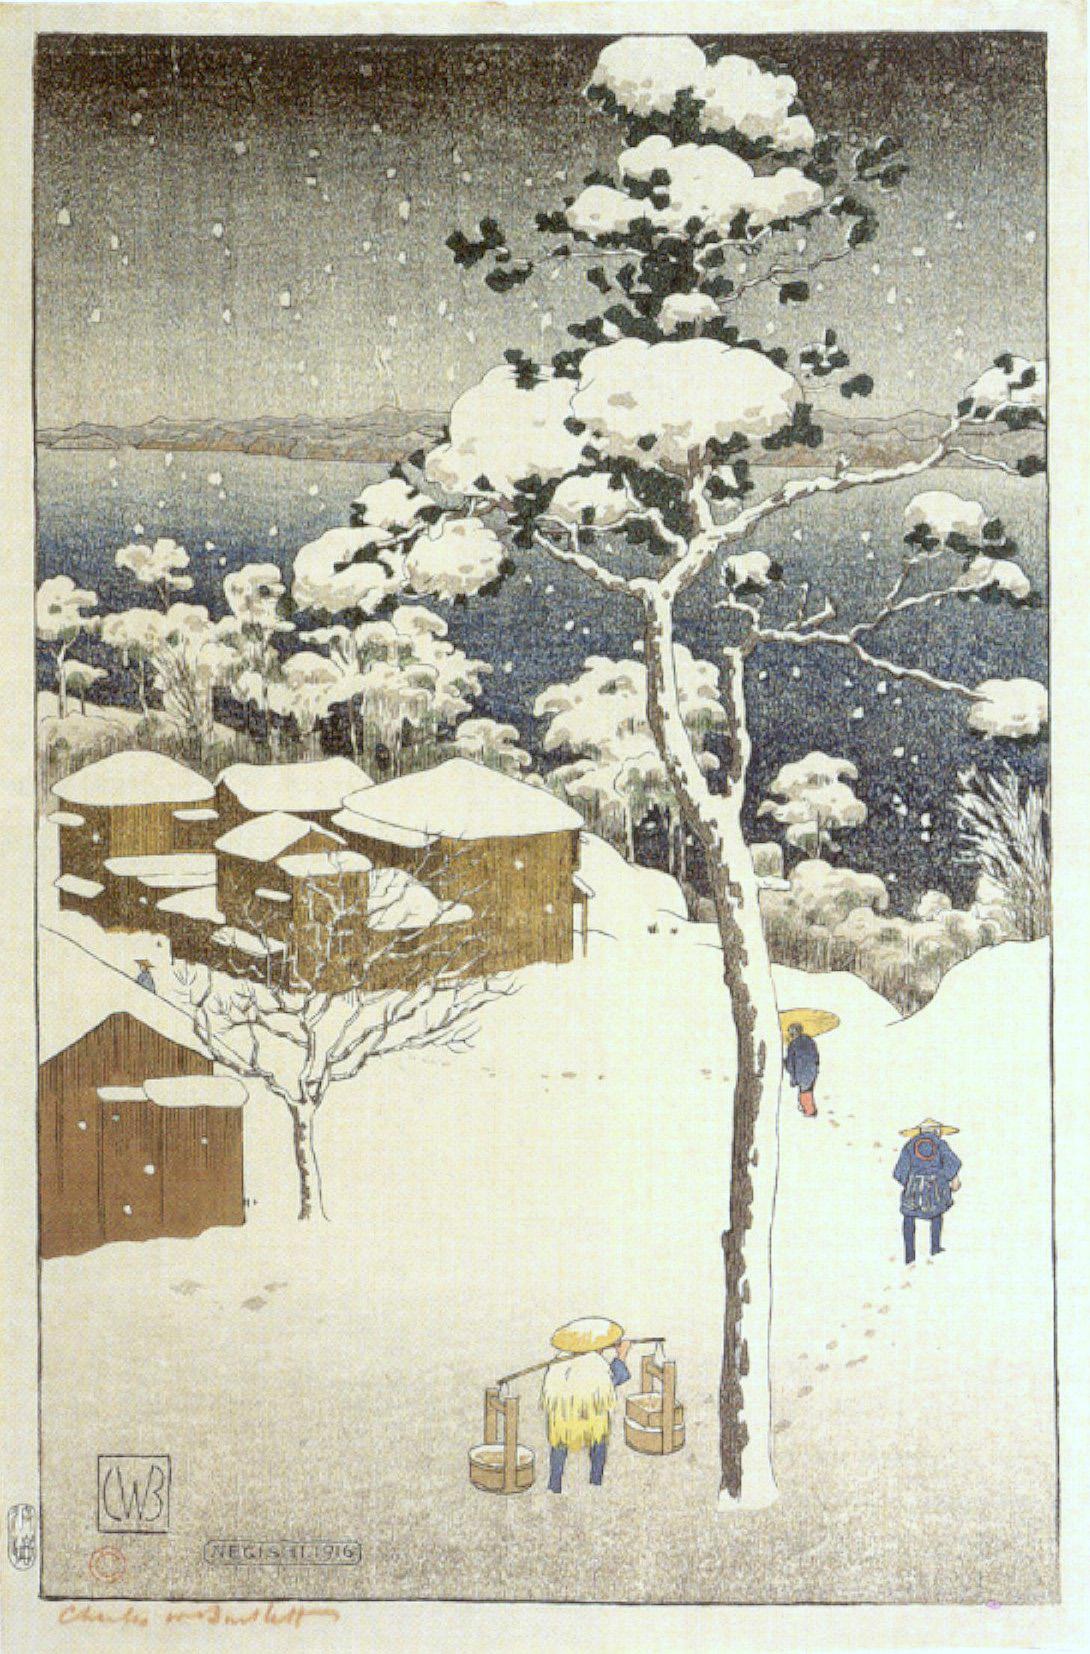 File:'Negishi -Japan-, woodblock print by Charles W